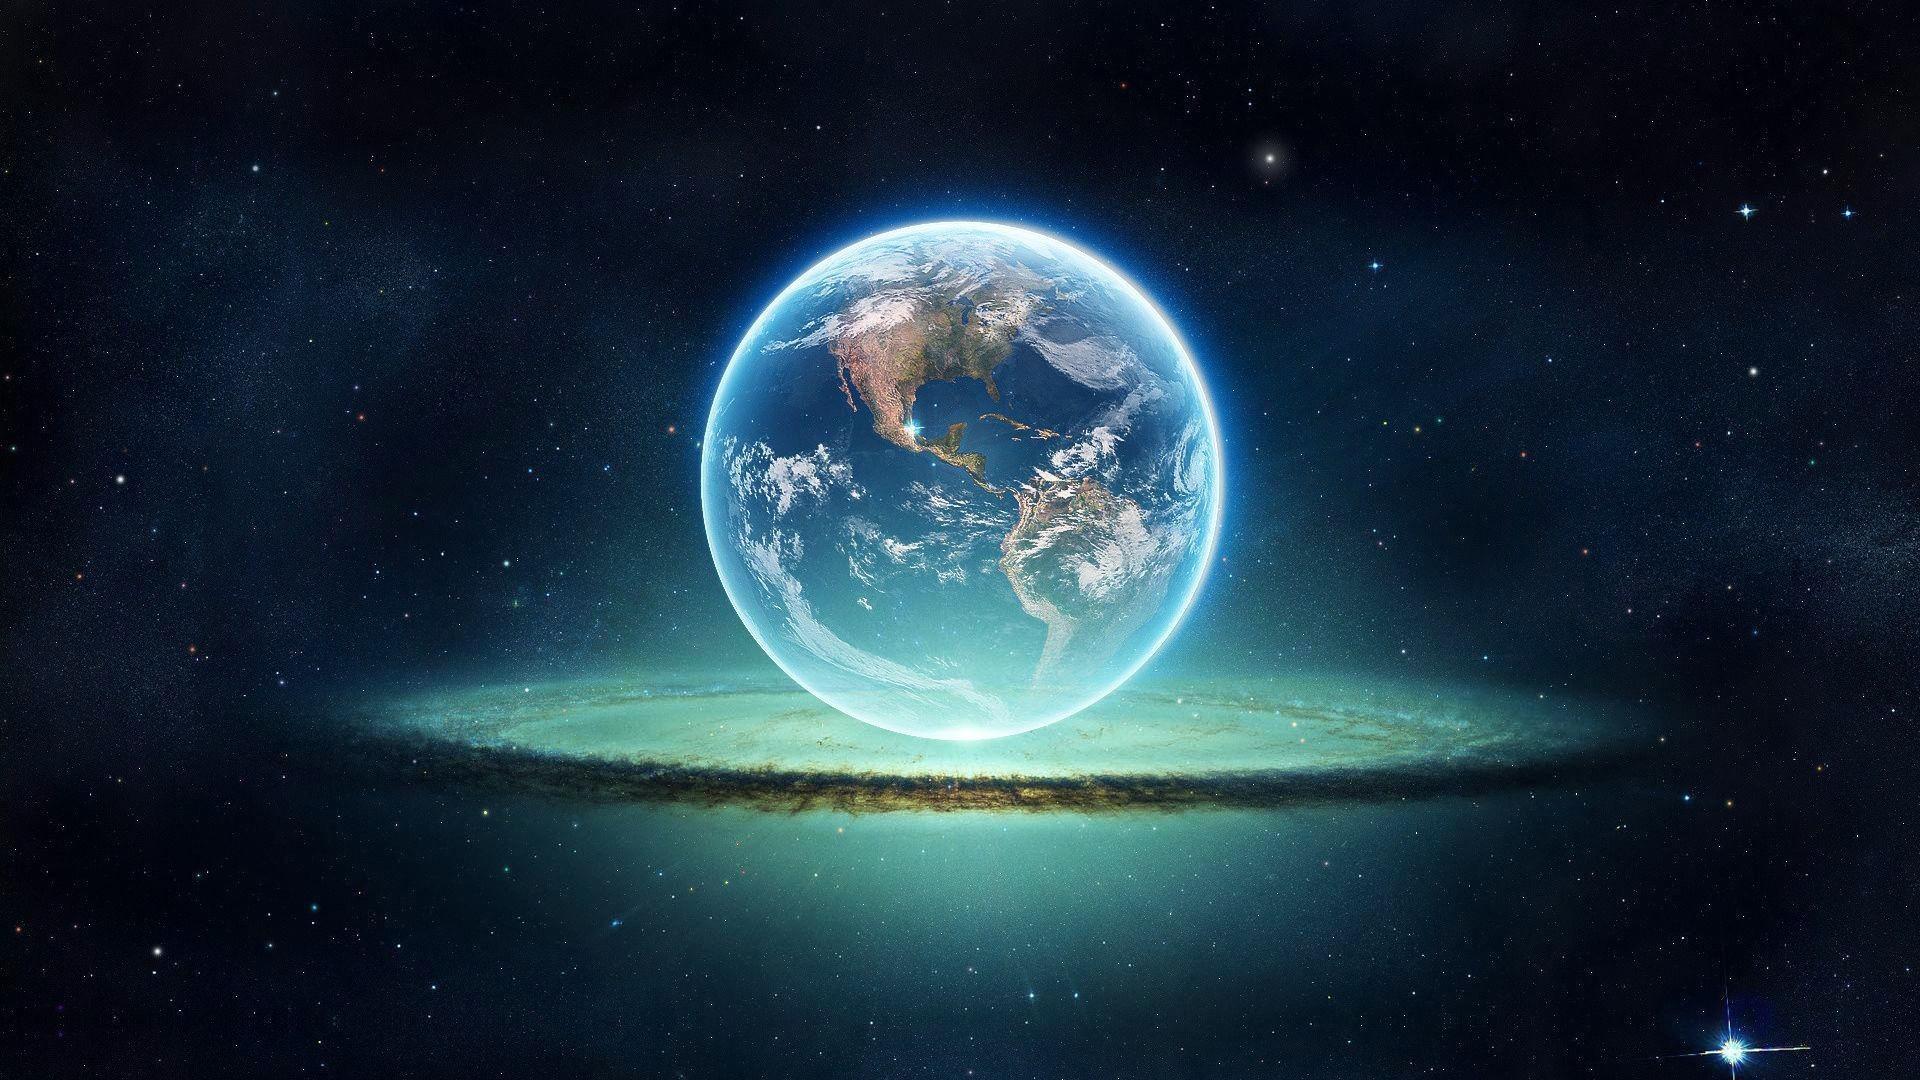 Planet Earth Wallpaper x